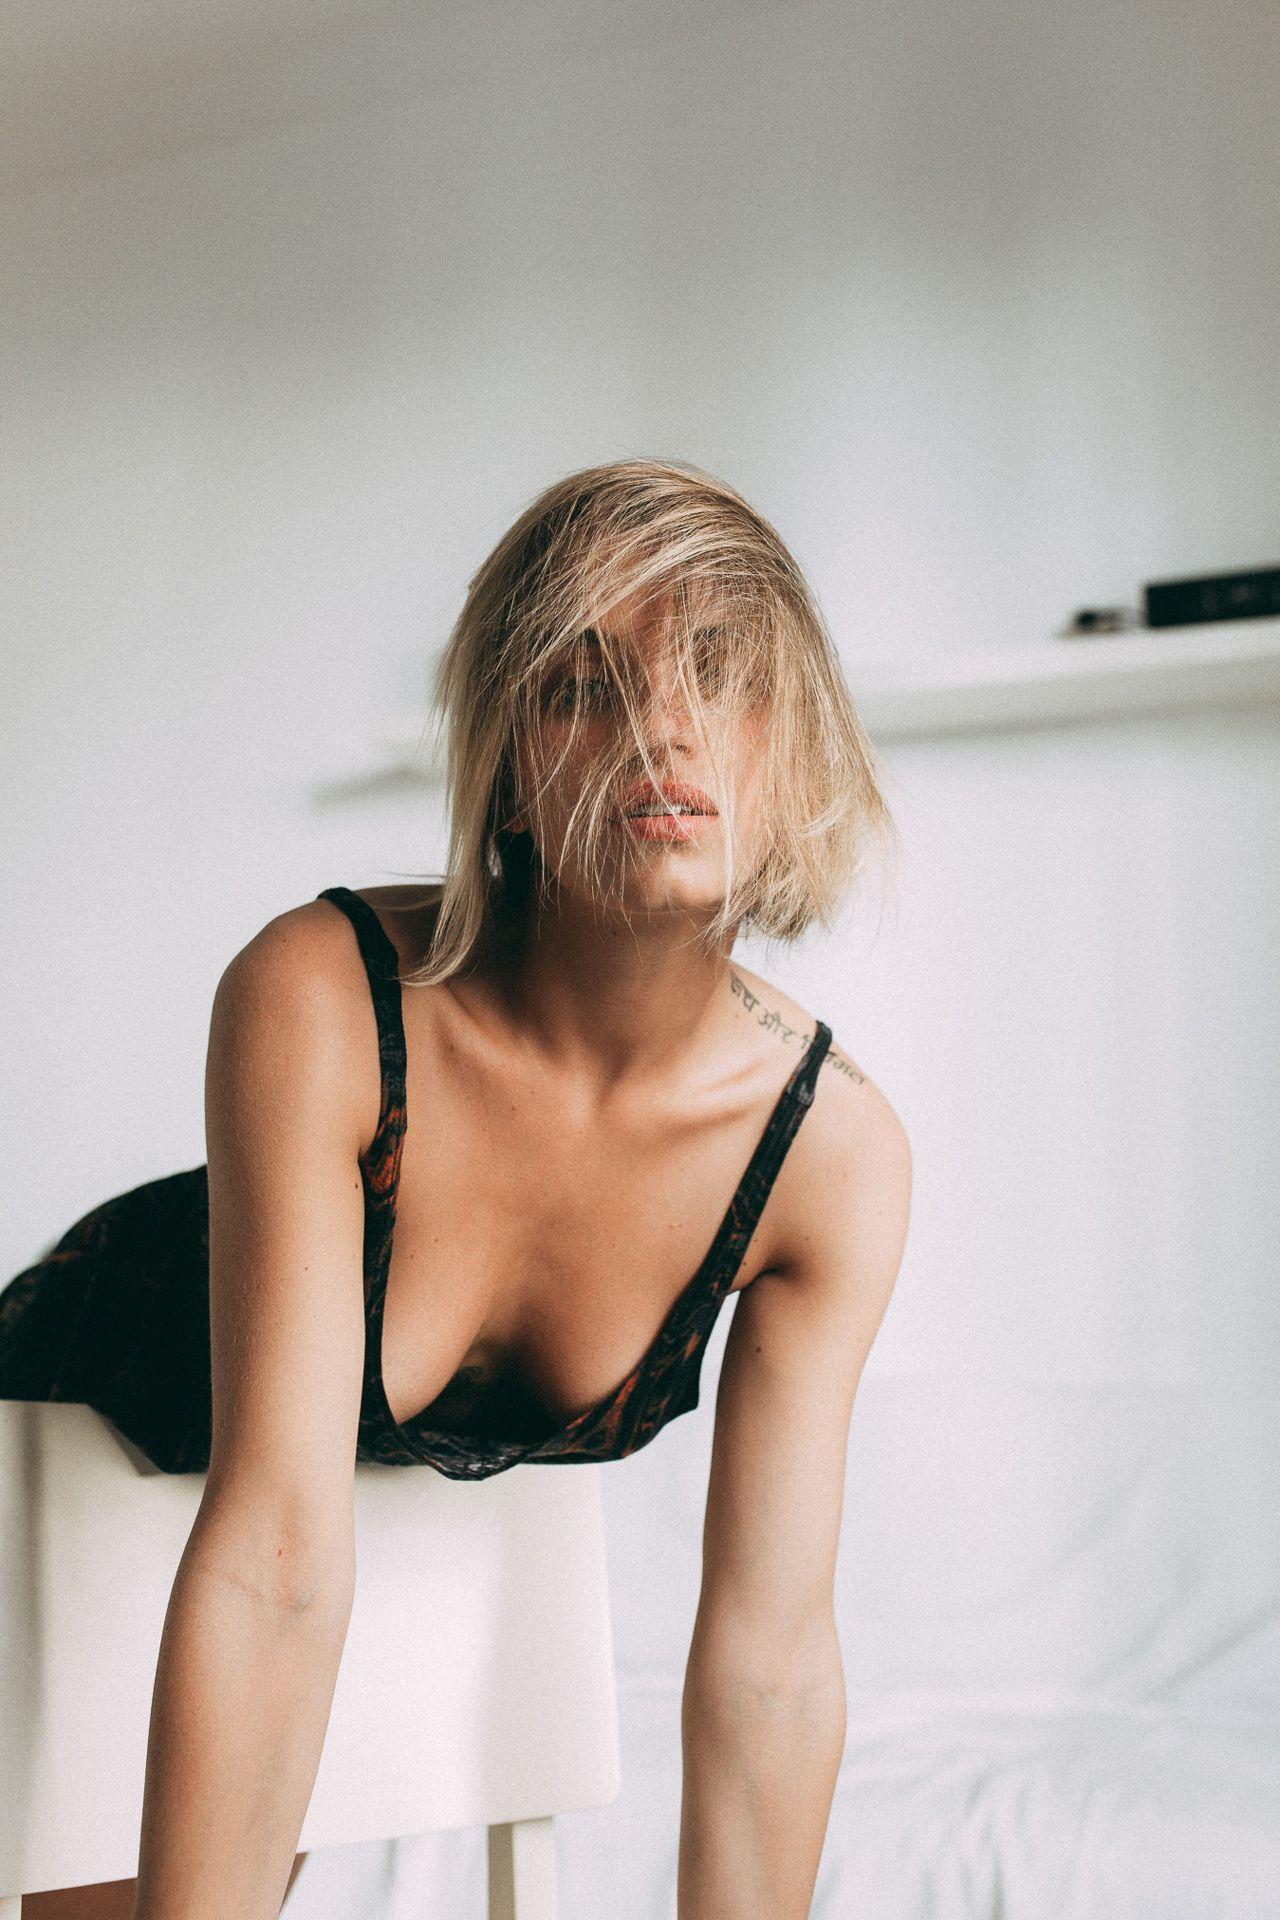 Valentina Georgia Pegorer nudes (23 photo), Ass, Bikini, Selfie, bra 2019